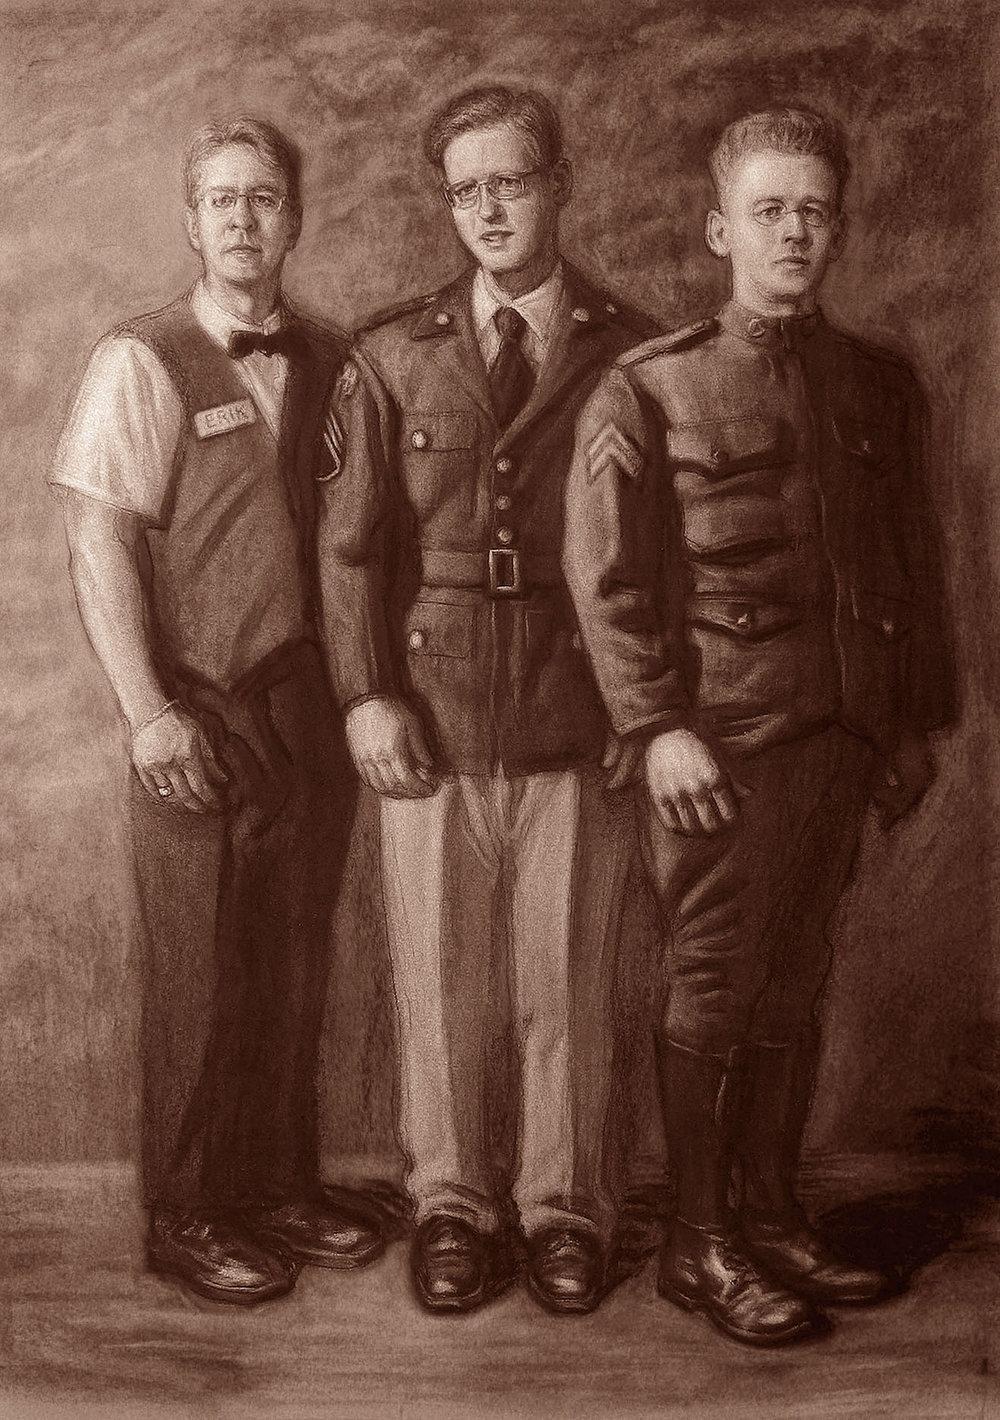 3 Generations of Olson's